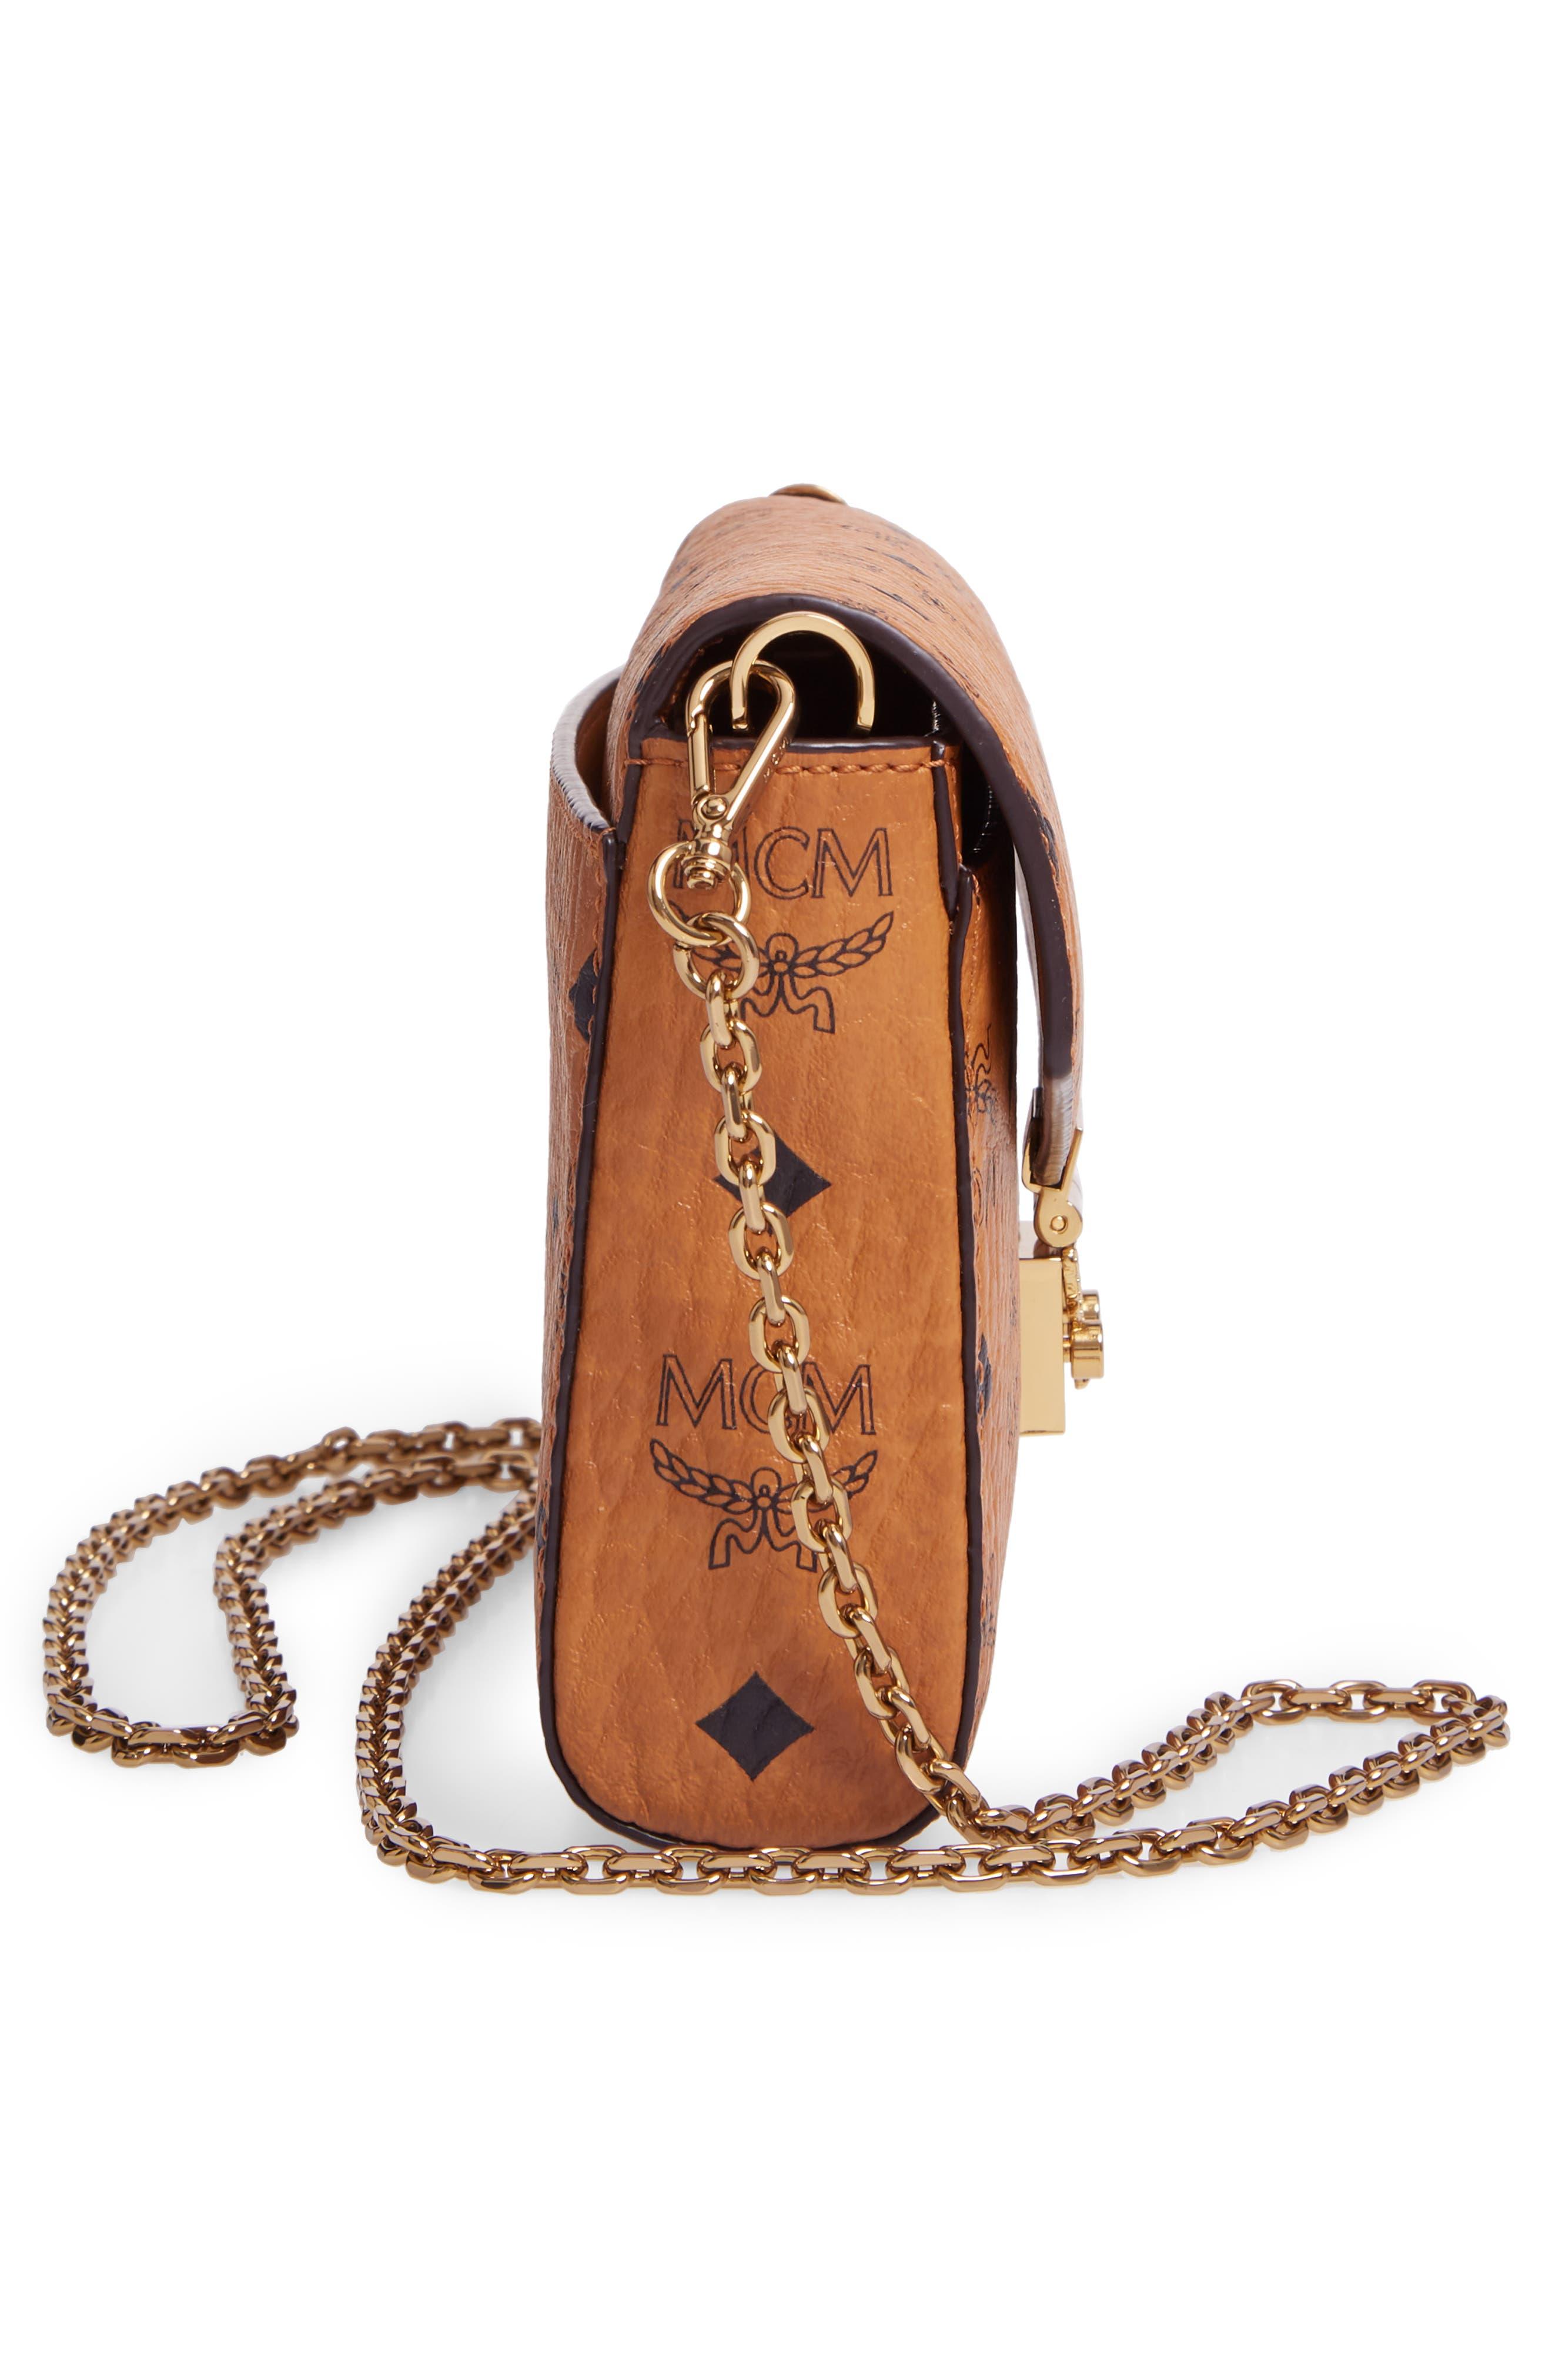 Millie Monogrammed Leather Crossbody Bag,                             Alternate thumbnail 5, color,                             COGNAC BROWN